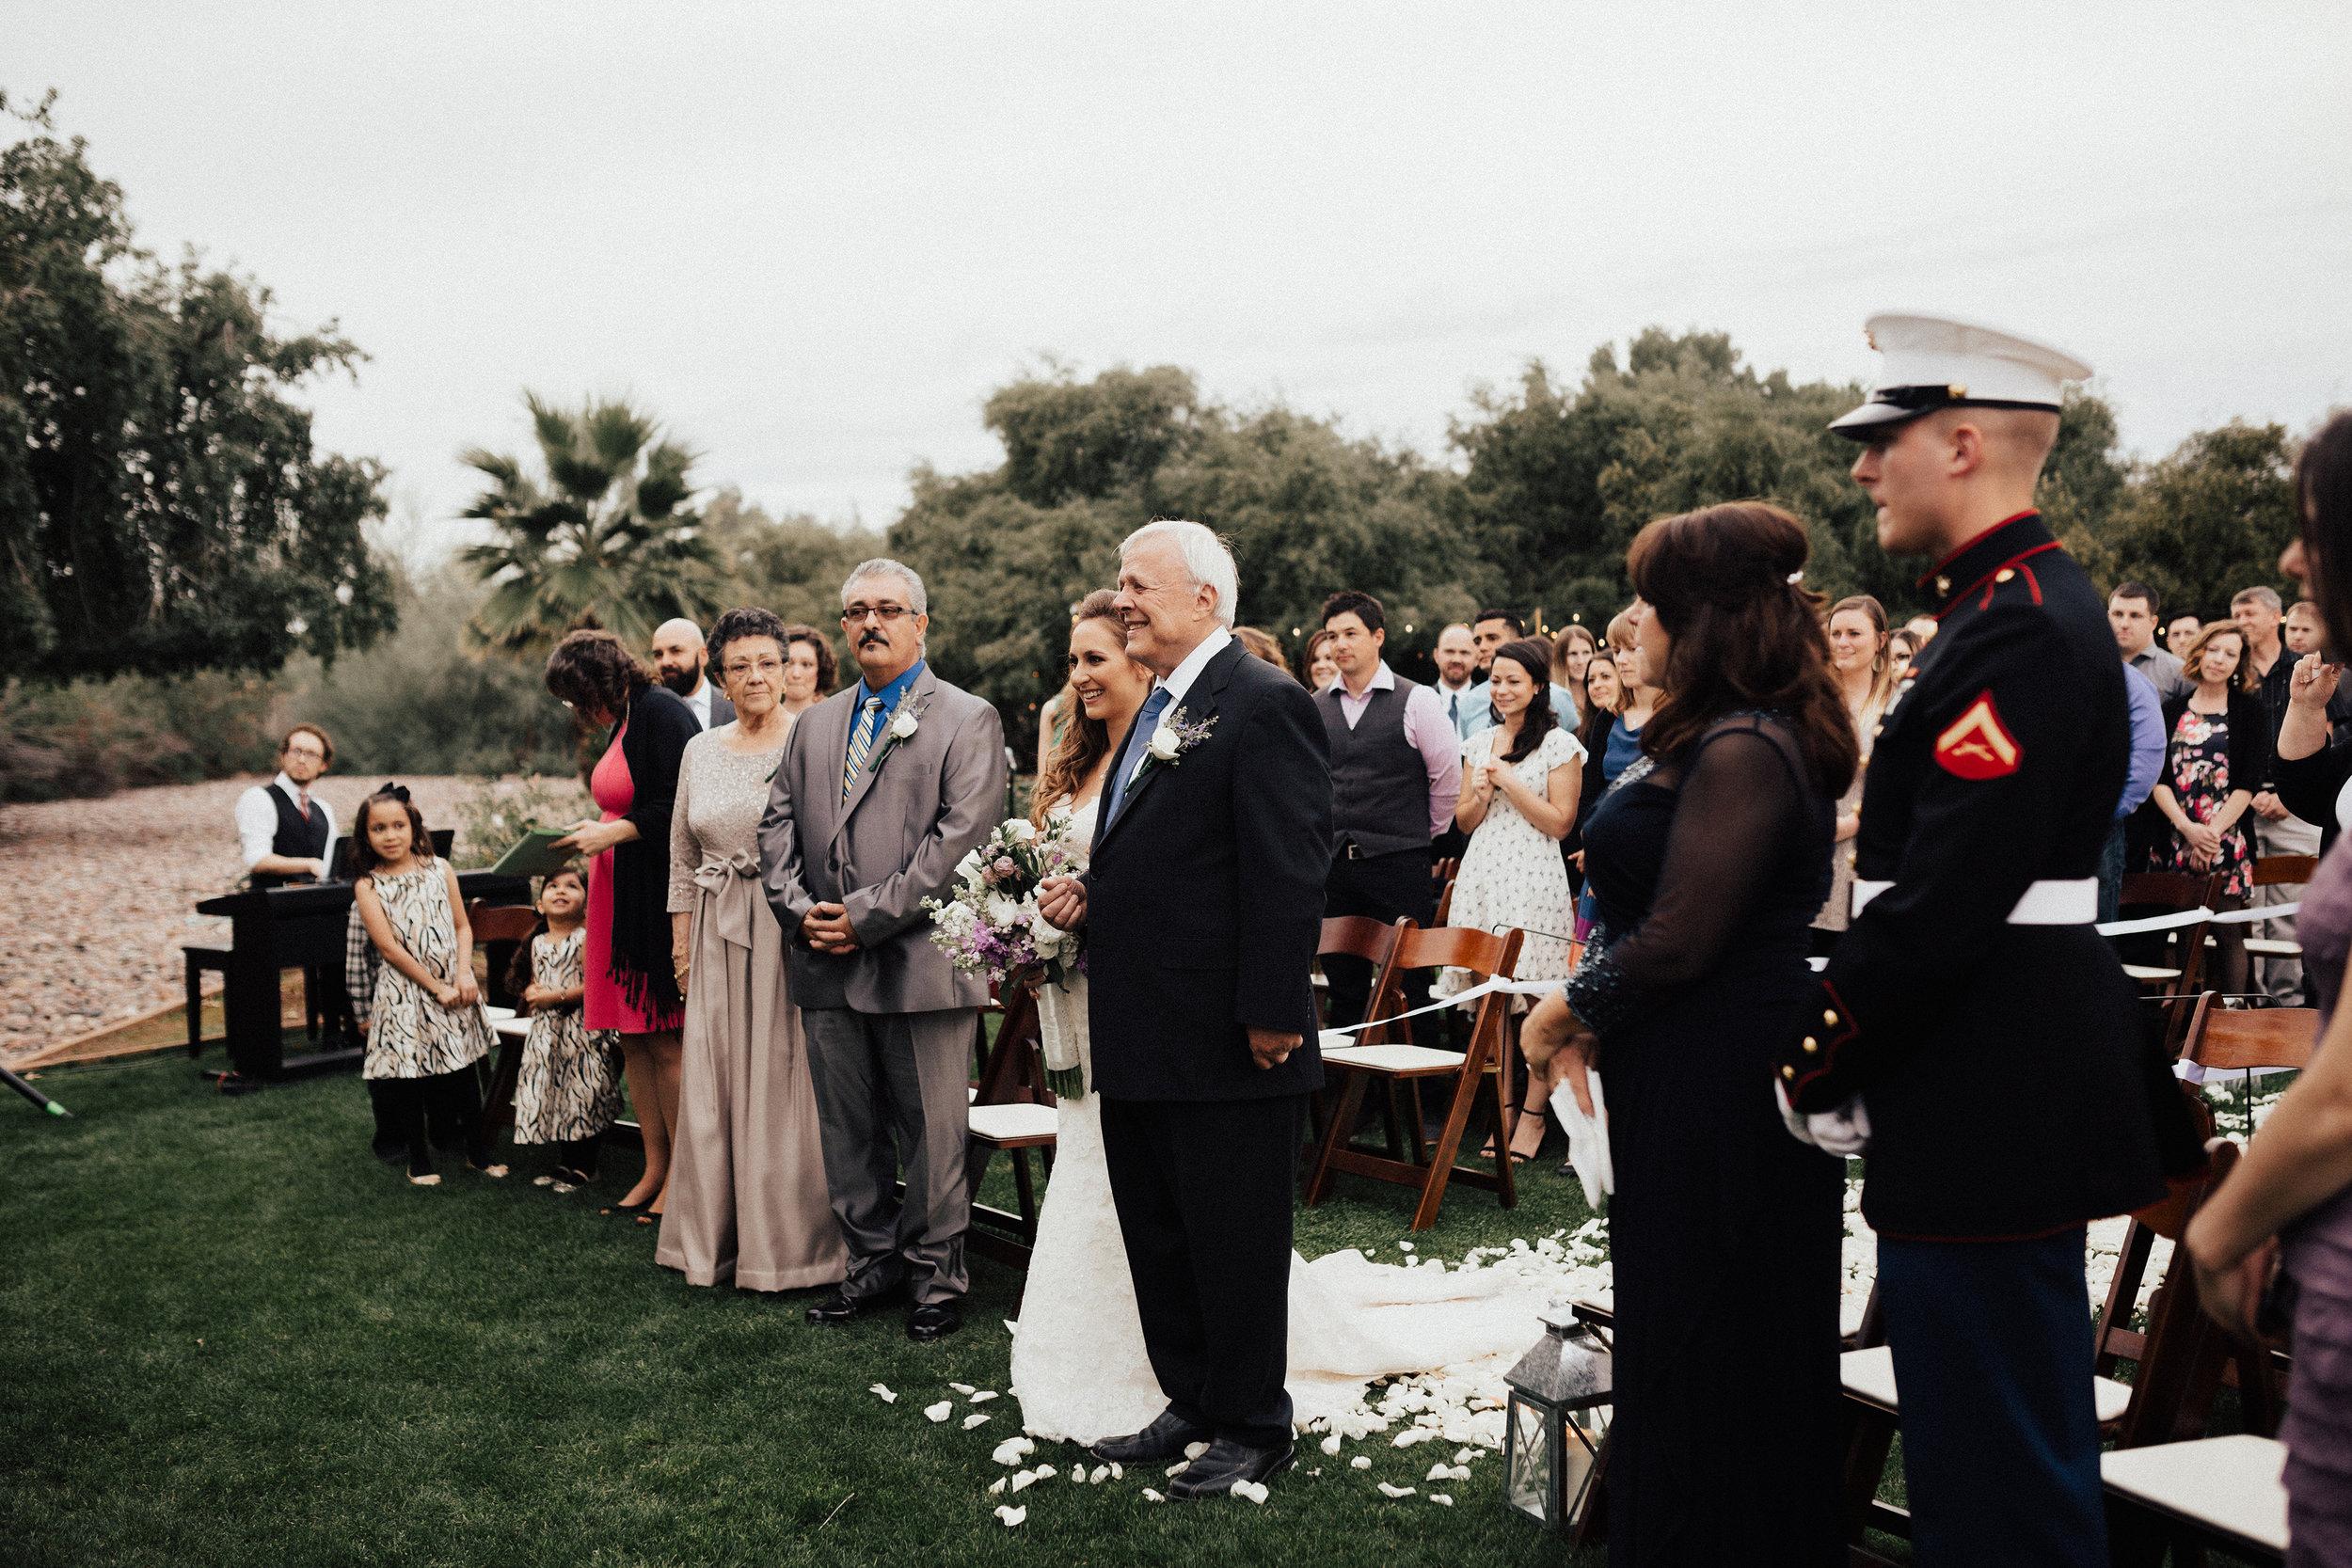 Lydia_Chris_Ceremony (49).jpg